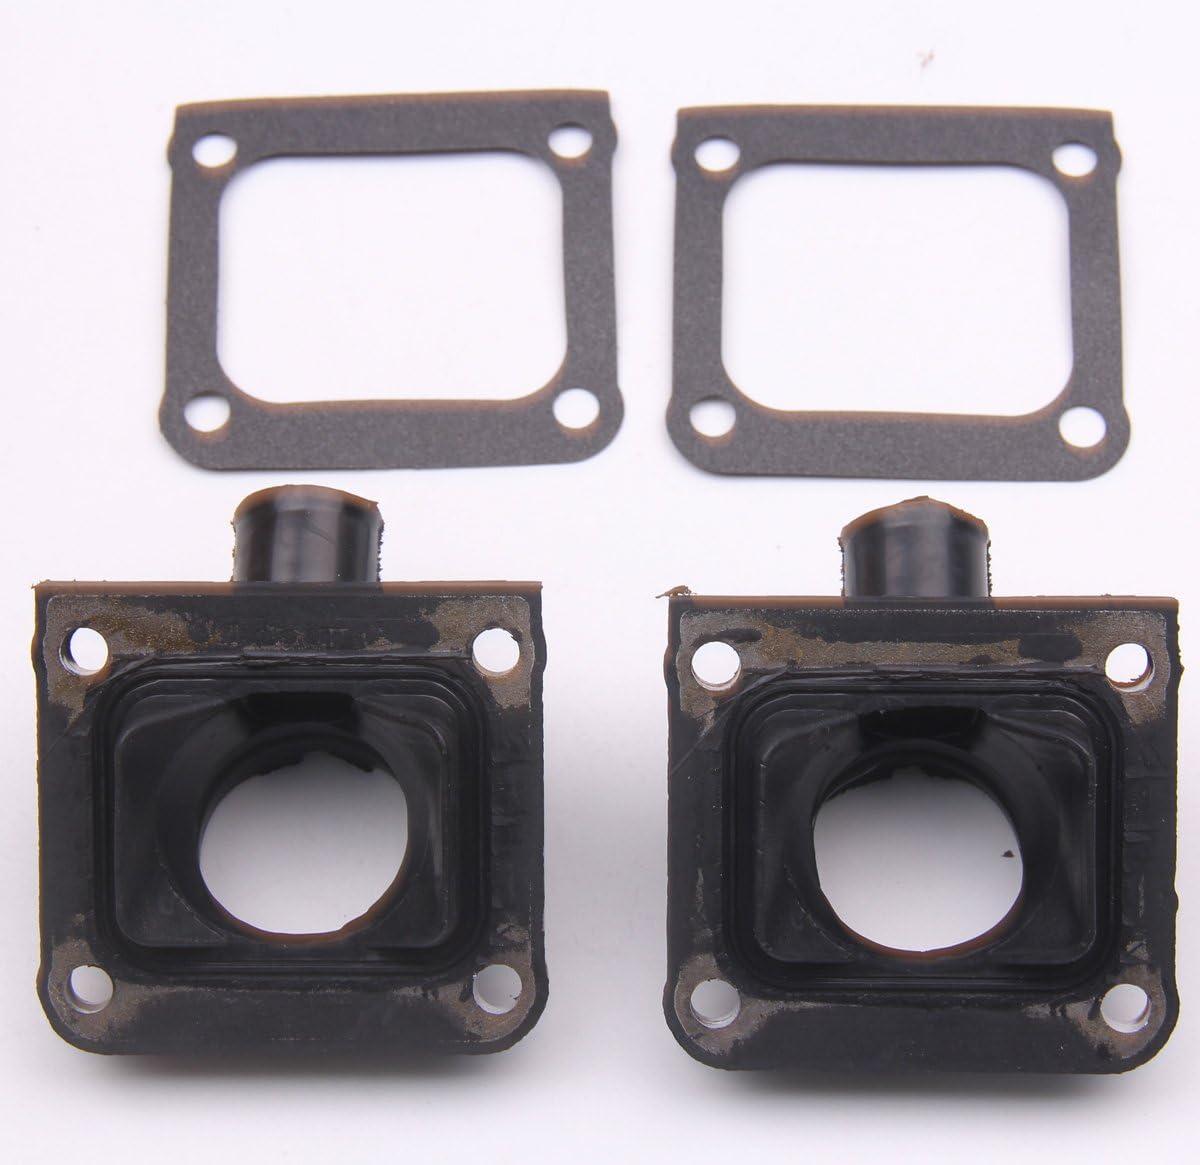 For Yamaha Warrior YFM350 Carb Intake Manifold 2 O-rings High-grade 2PCS!